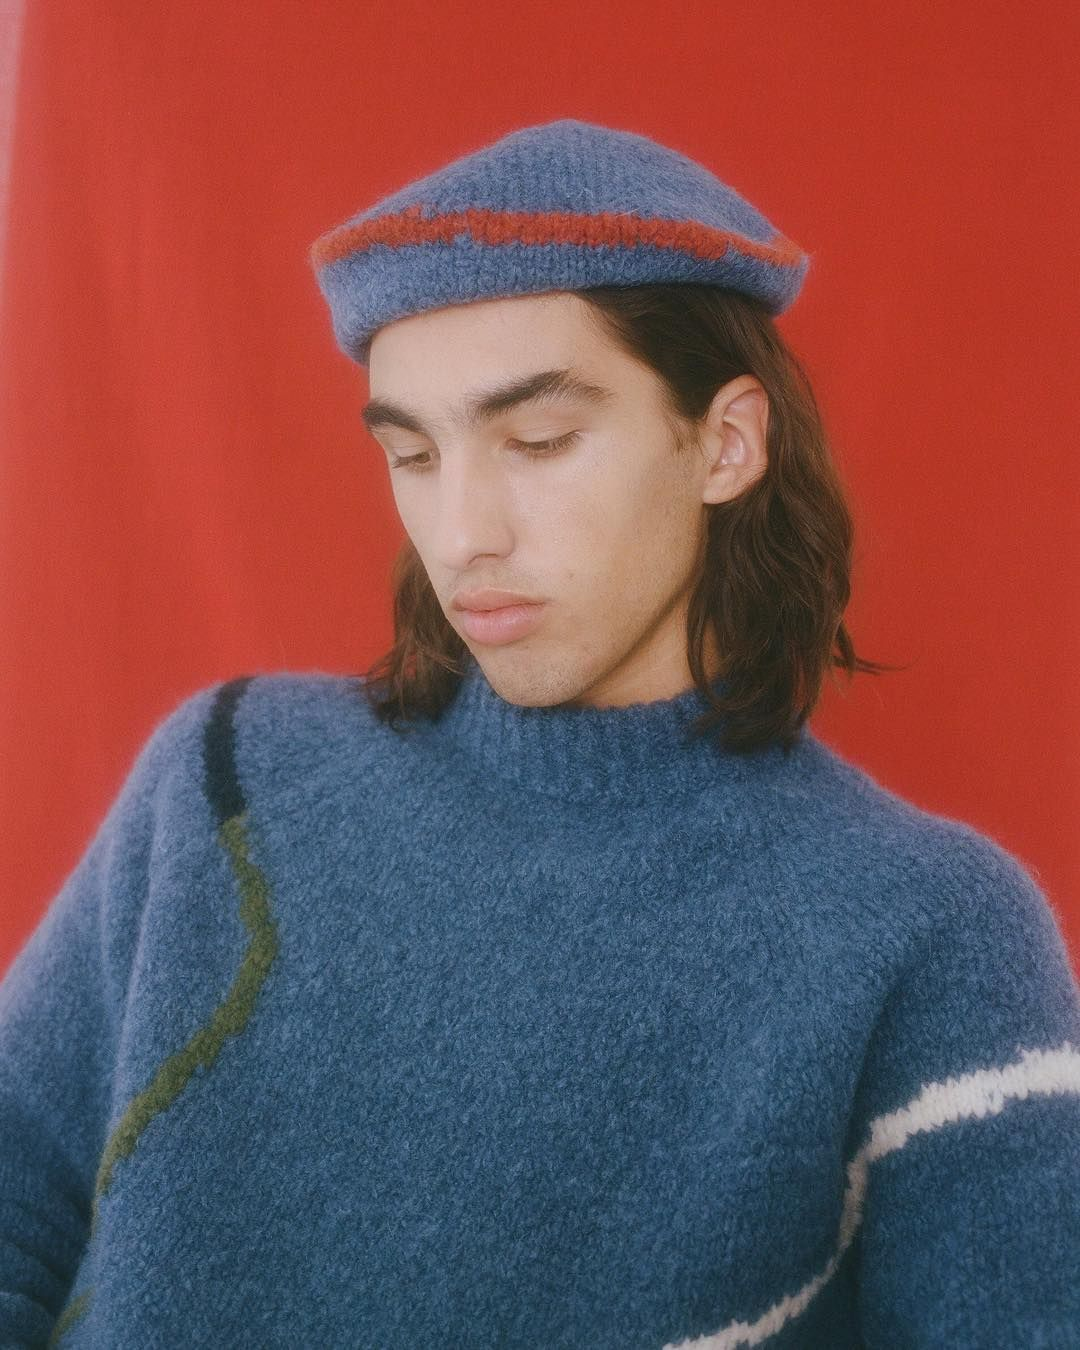 Paloma Wool On Instagram Matteo In The Libra Sweater Fashun